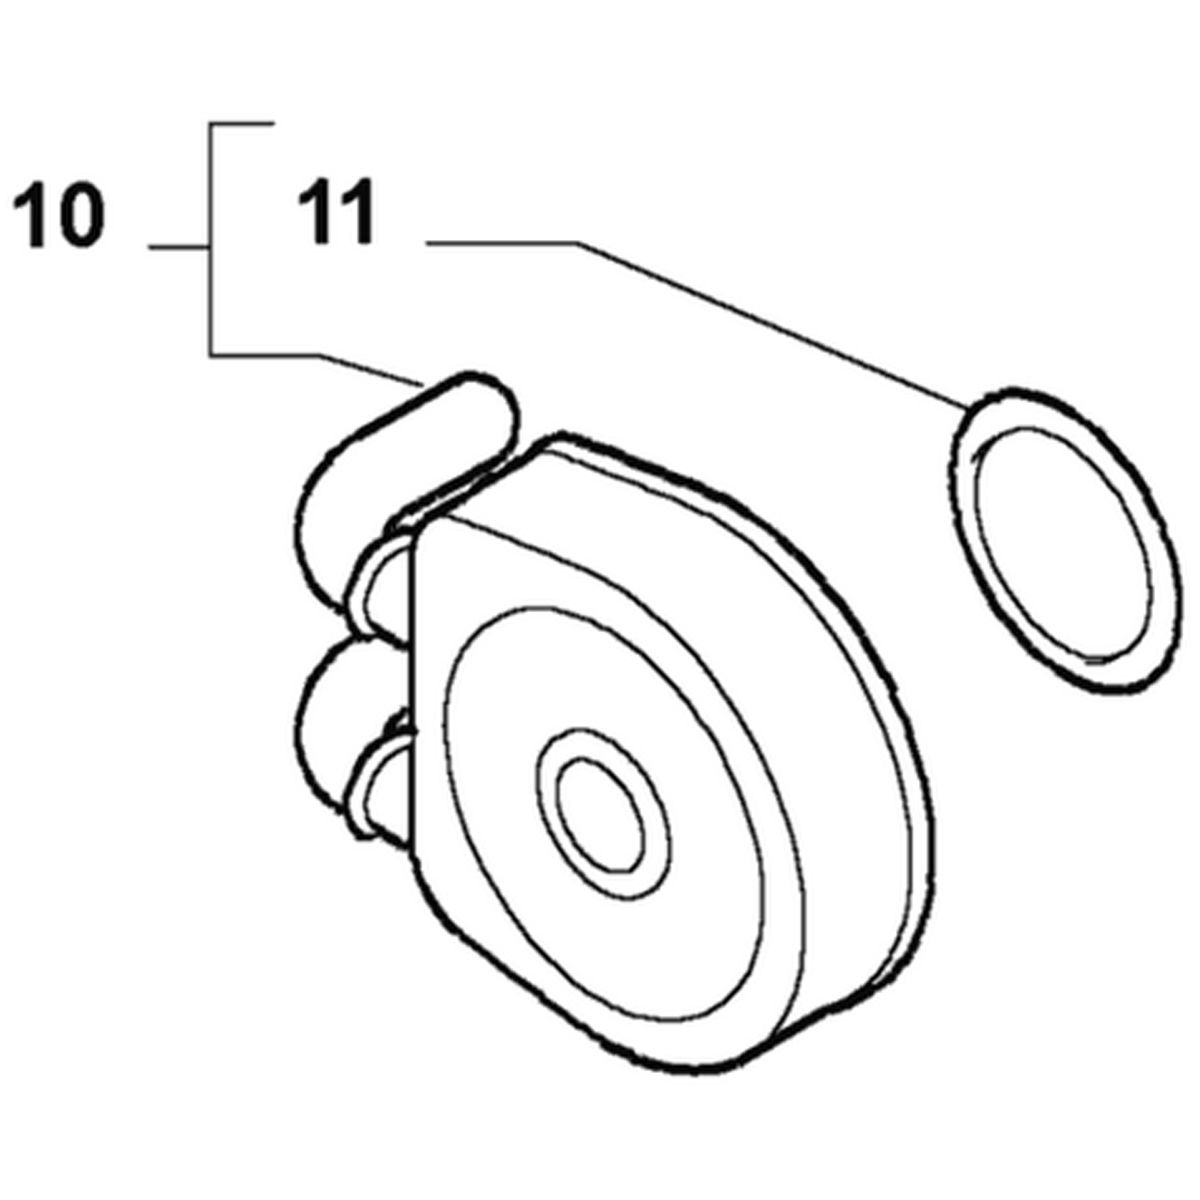 Fiat Ducato 2 3 Jtd Wiring Diagram